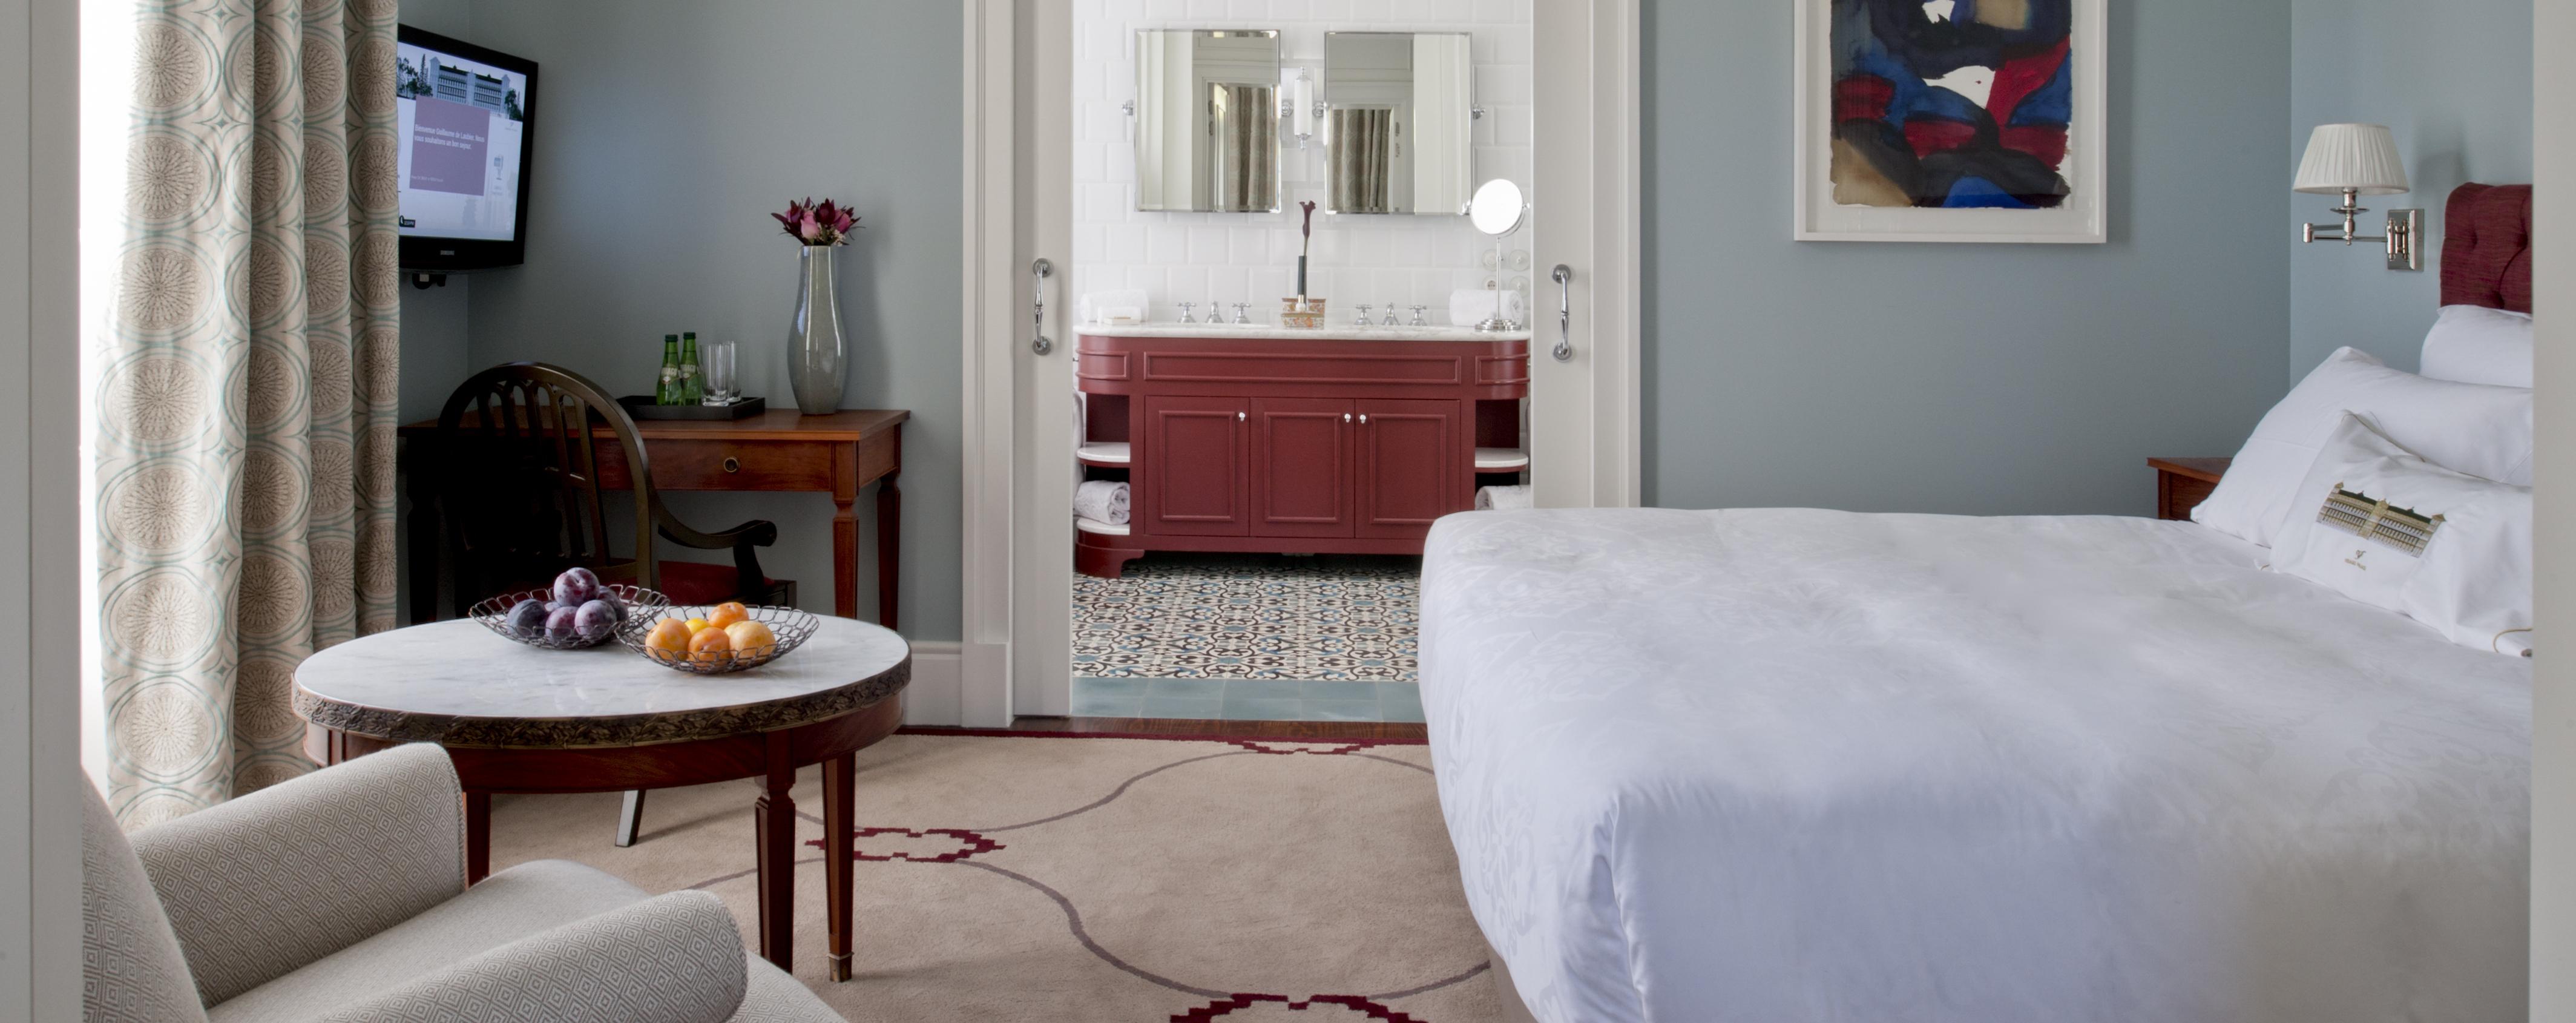 vidago-palace-privilege-room